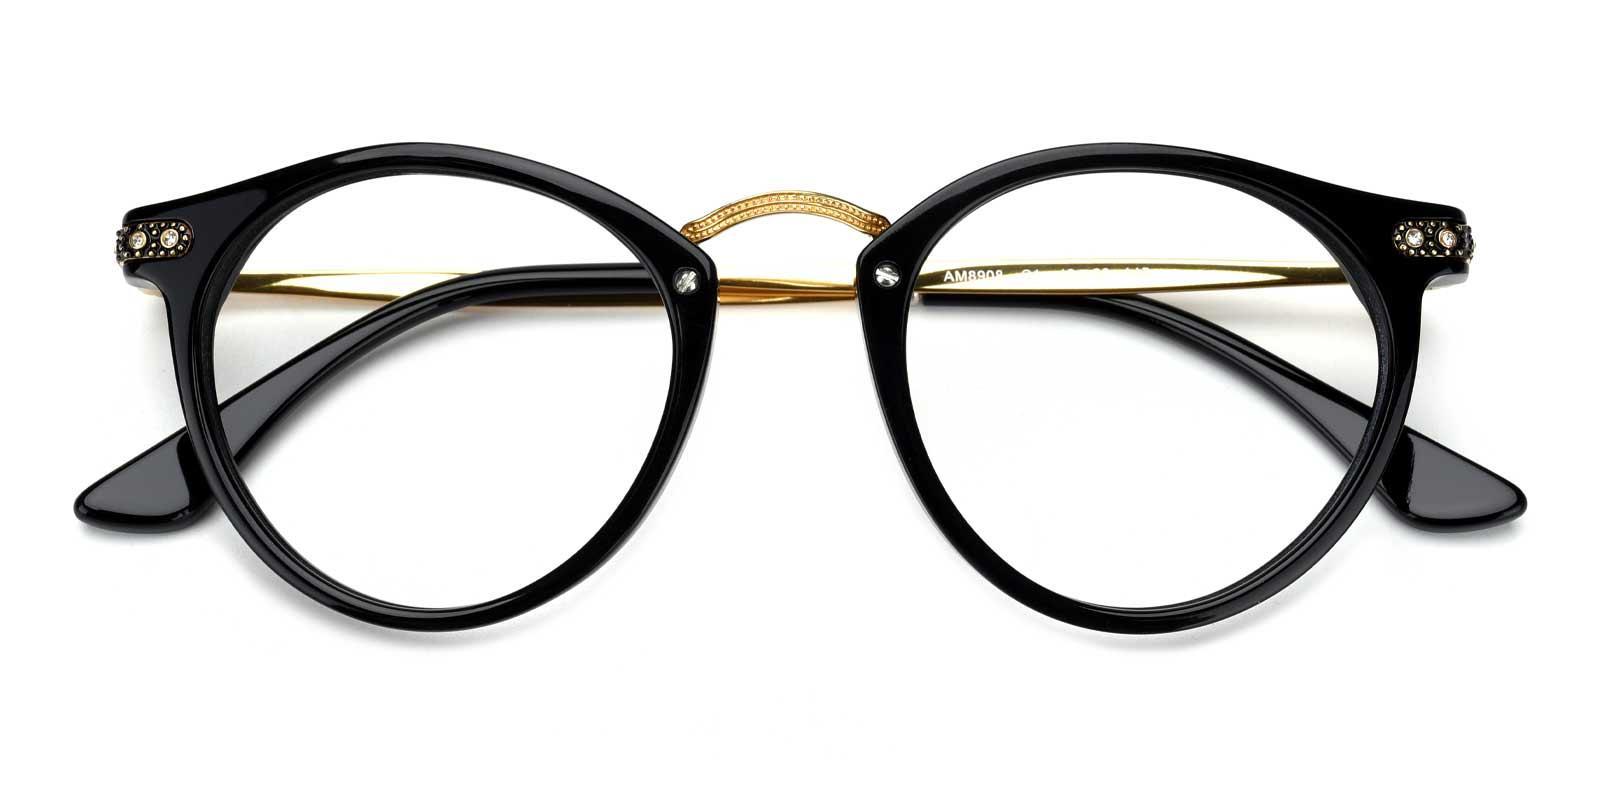 Donna-Black-Round-Acetate-Eyeglasses-detail